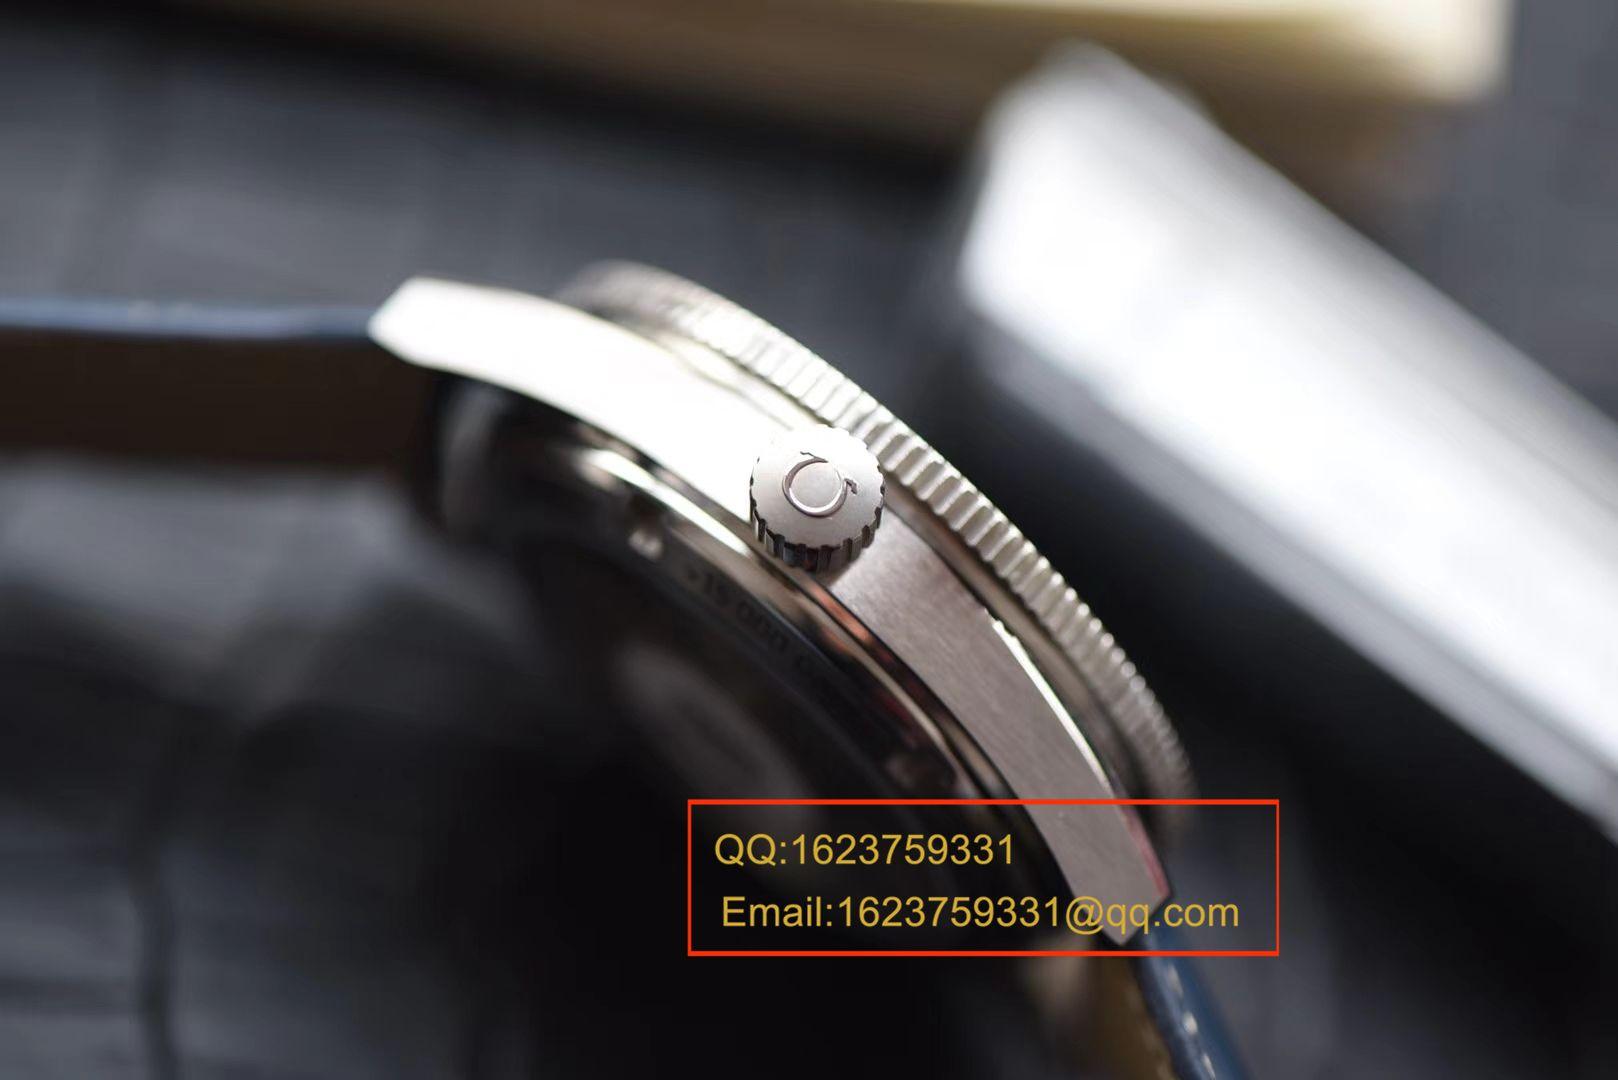 【XF一比一超A高仿手表】欧米茄海马300米系列233.92.41.21.03.001 、 233.22.41.21.01.002、233.62.41.21.01.002腕表